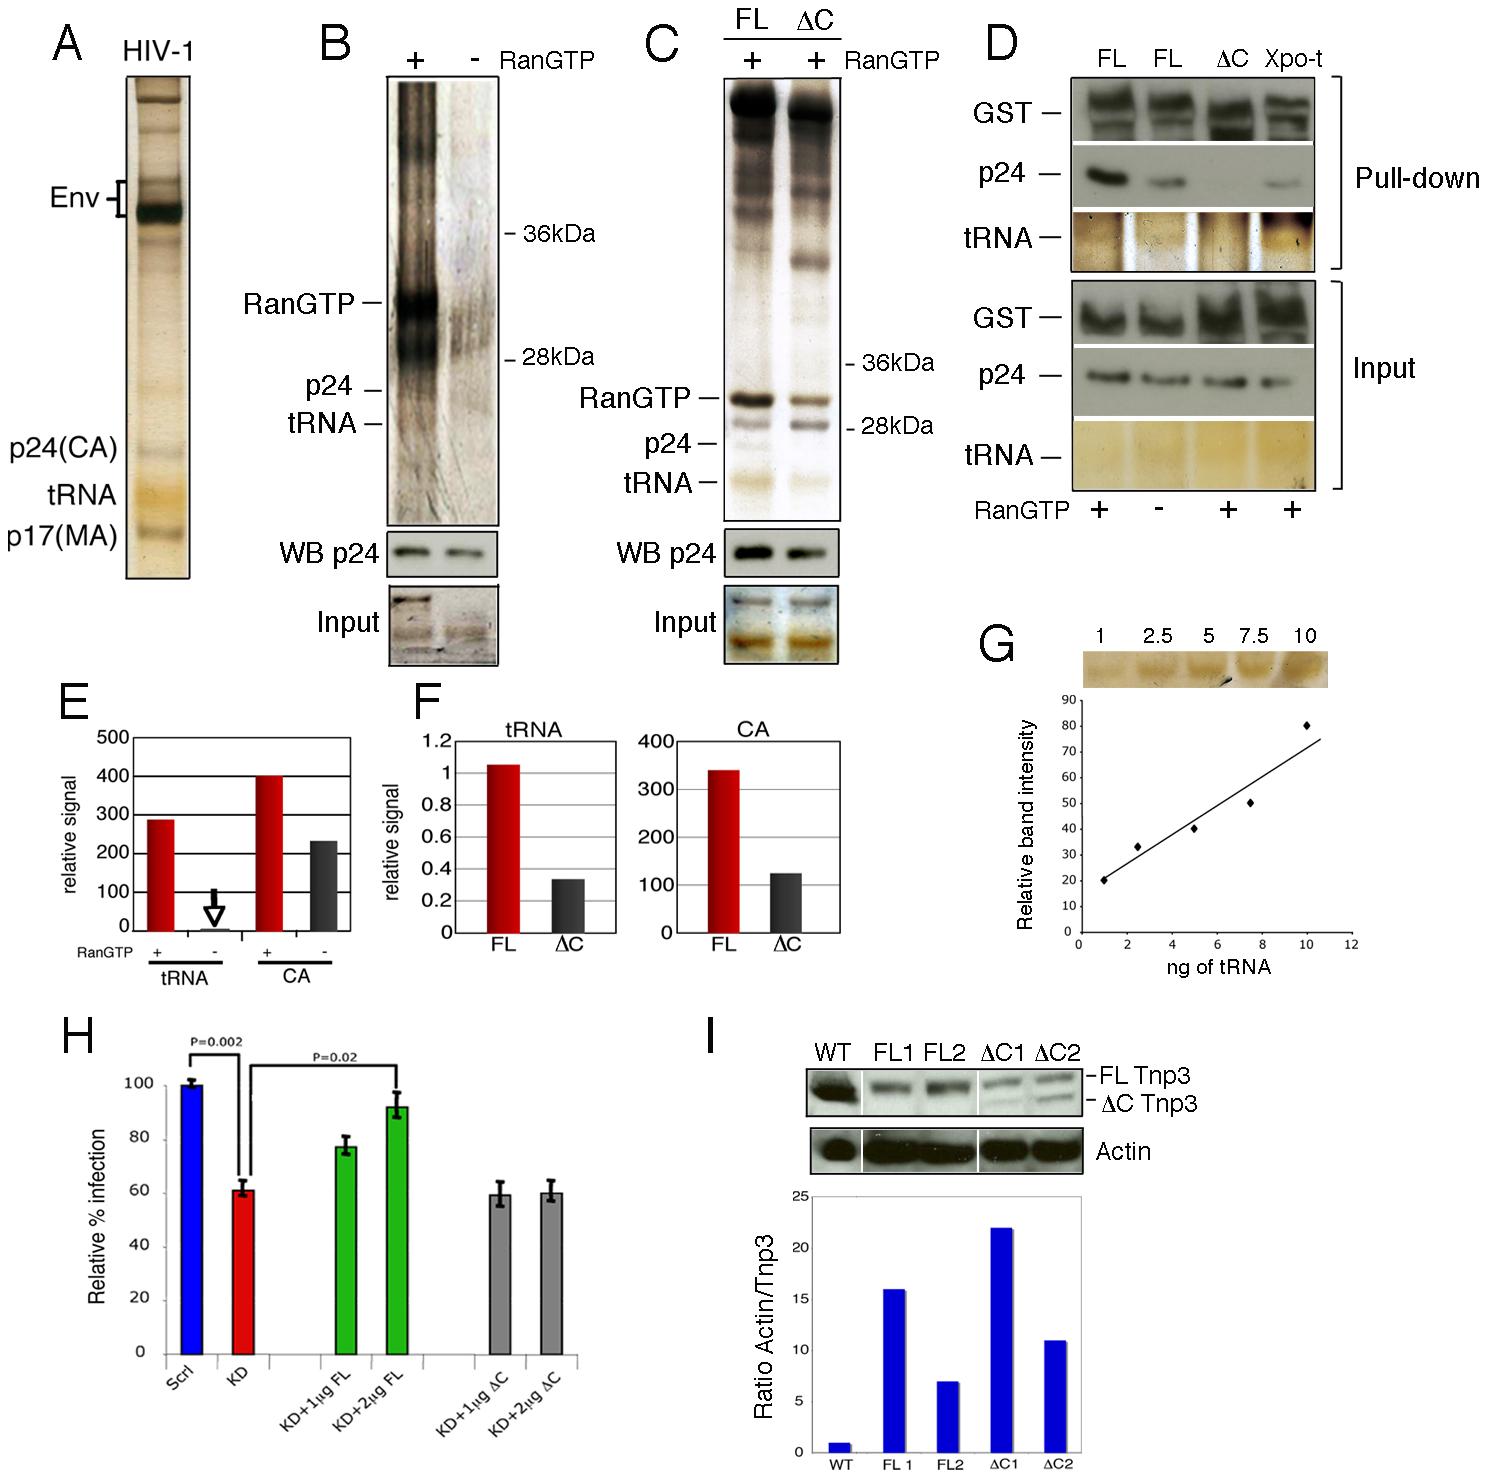 Tnp3 binds viral tRNA and CA.